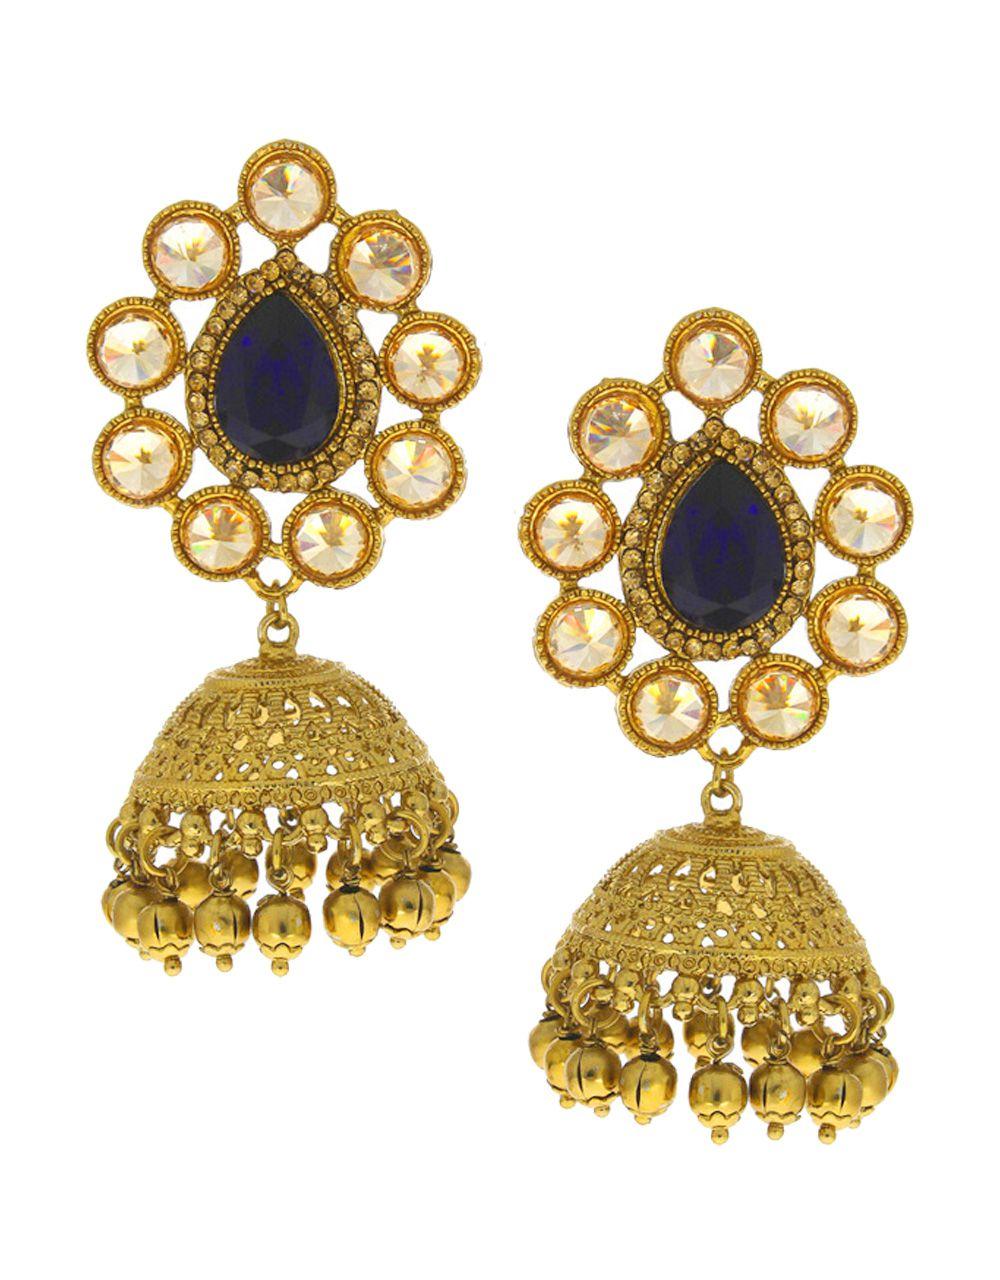 Anuradha Art Blue Colour Very Classy First Look Beautiful Traditional Jhumki/Jhumkas Earrings For Women/Girls